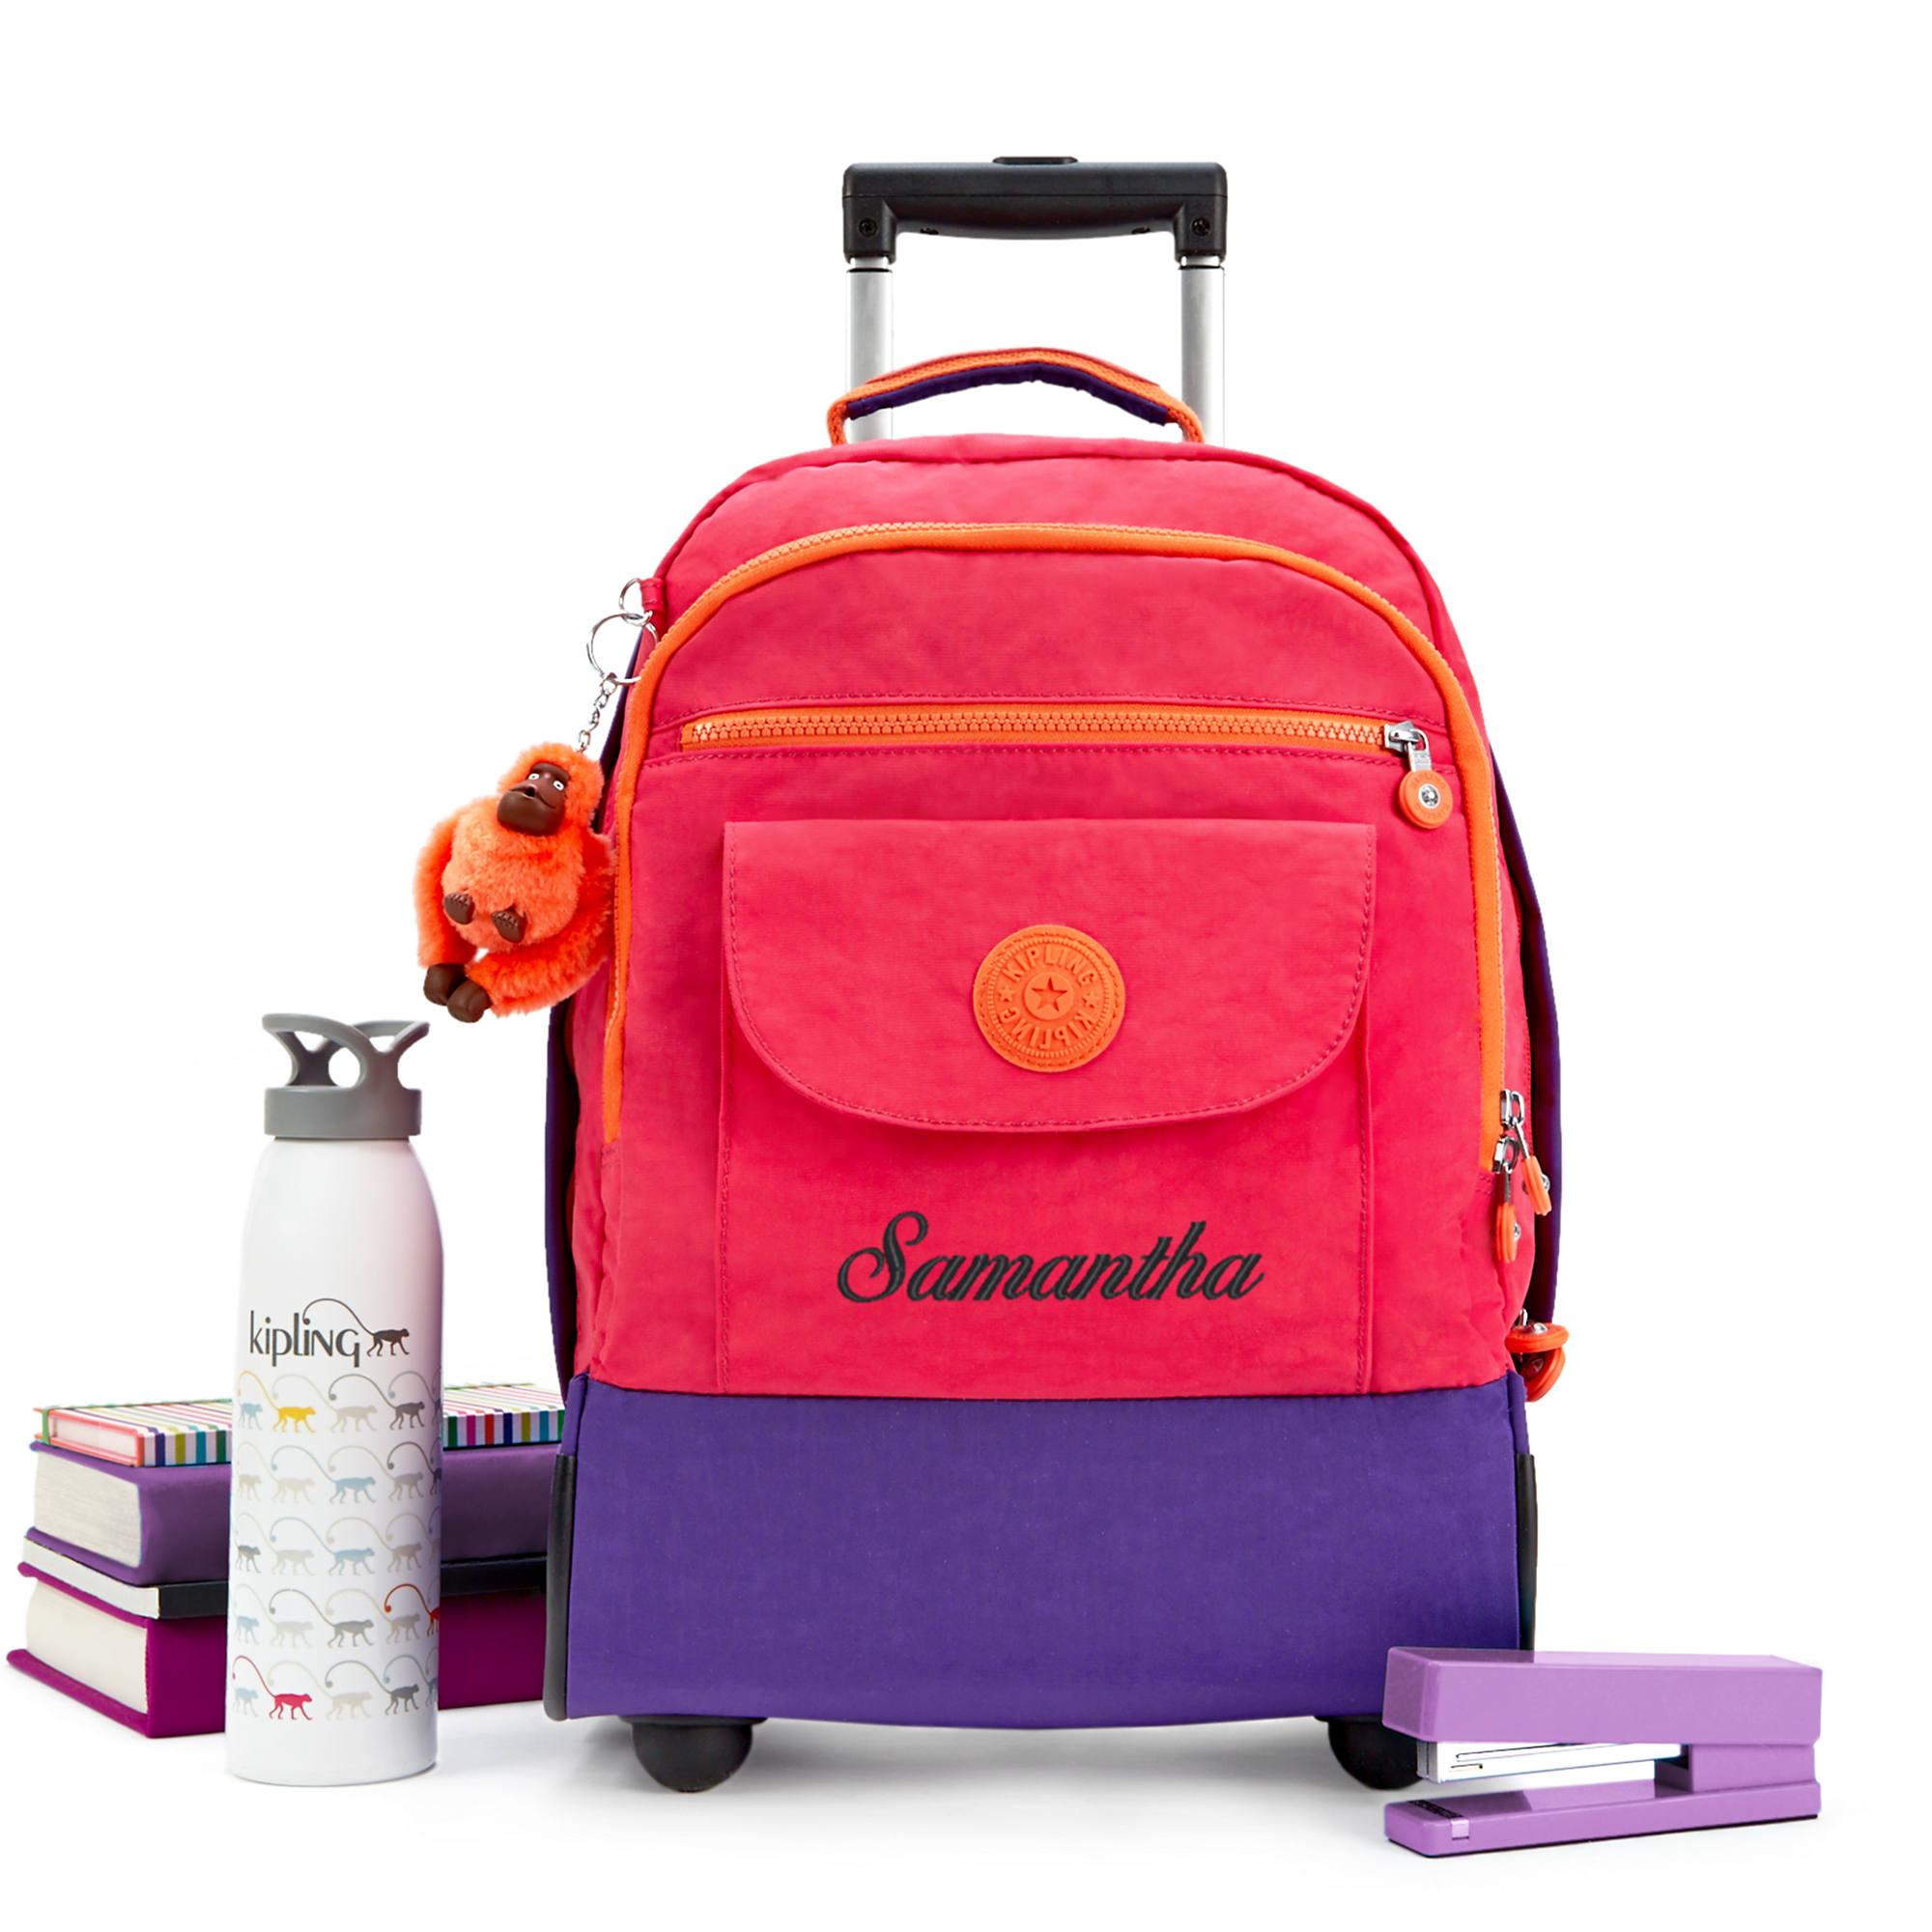 Sanaa Rolling Backpack  01a92e37eb08b